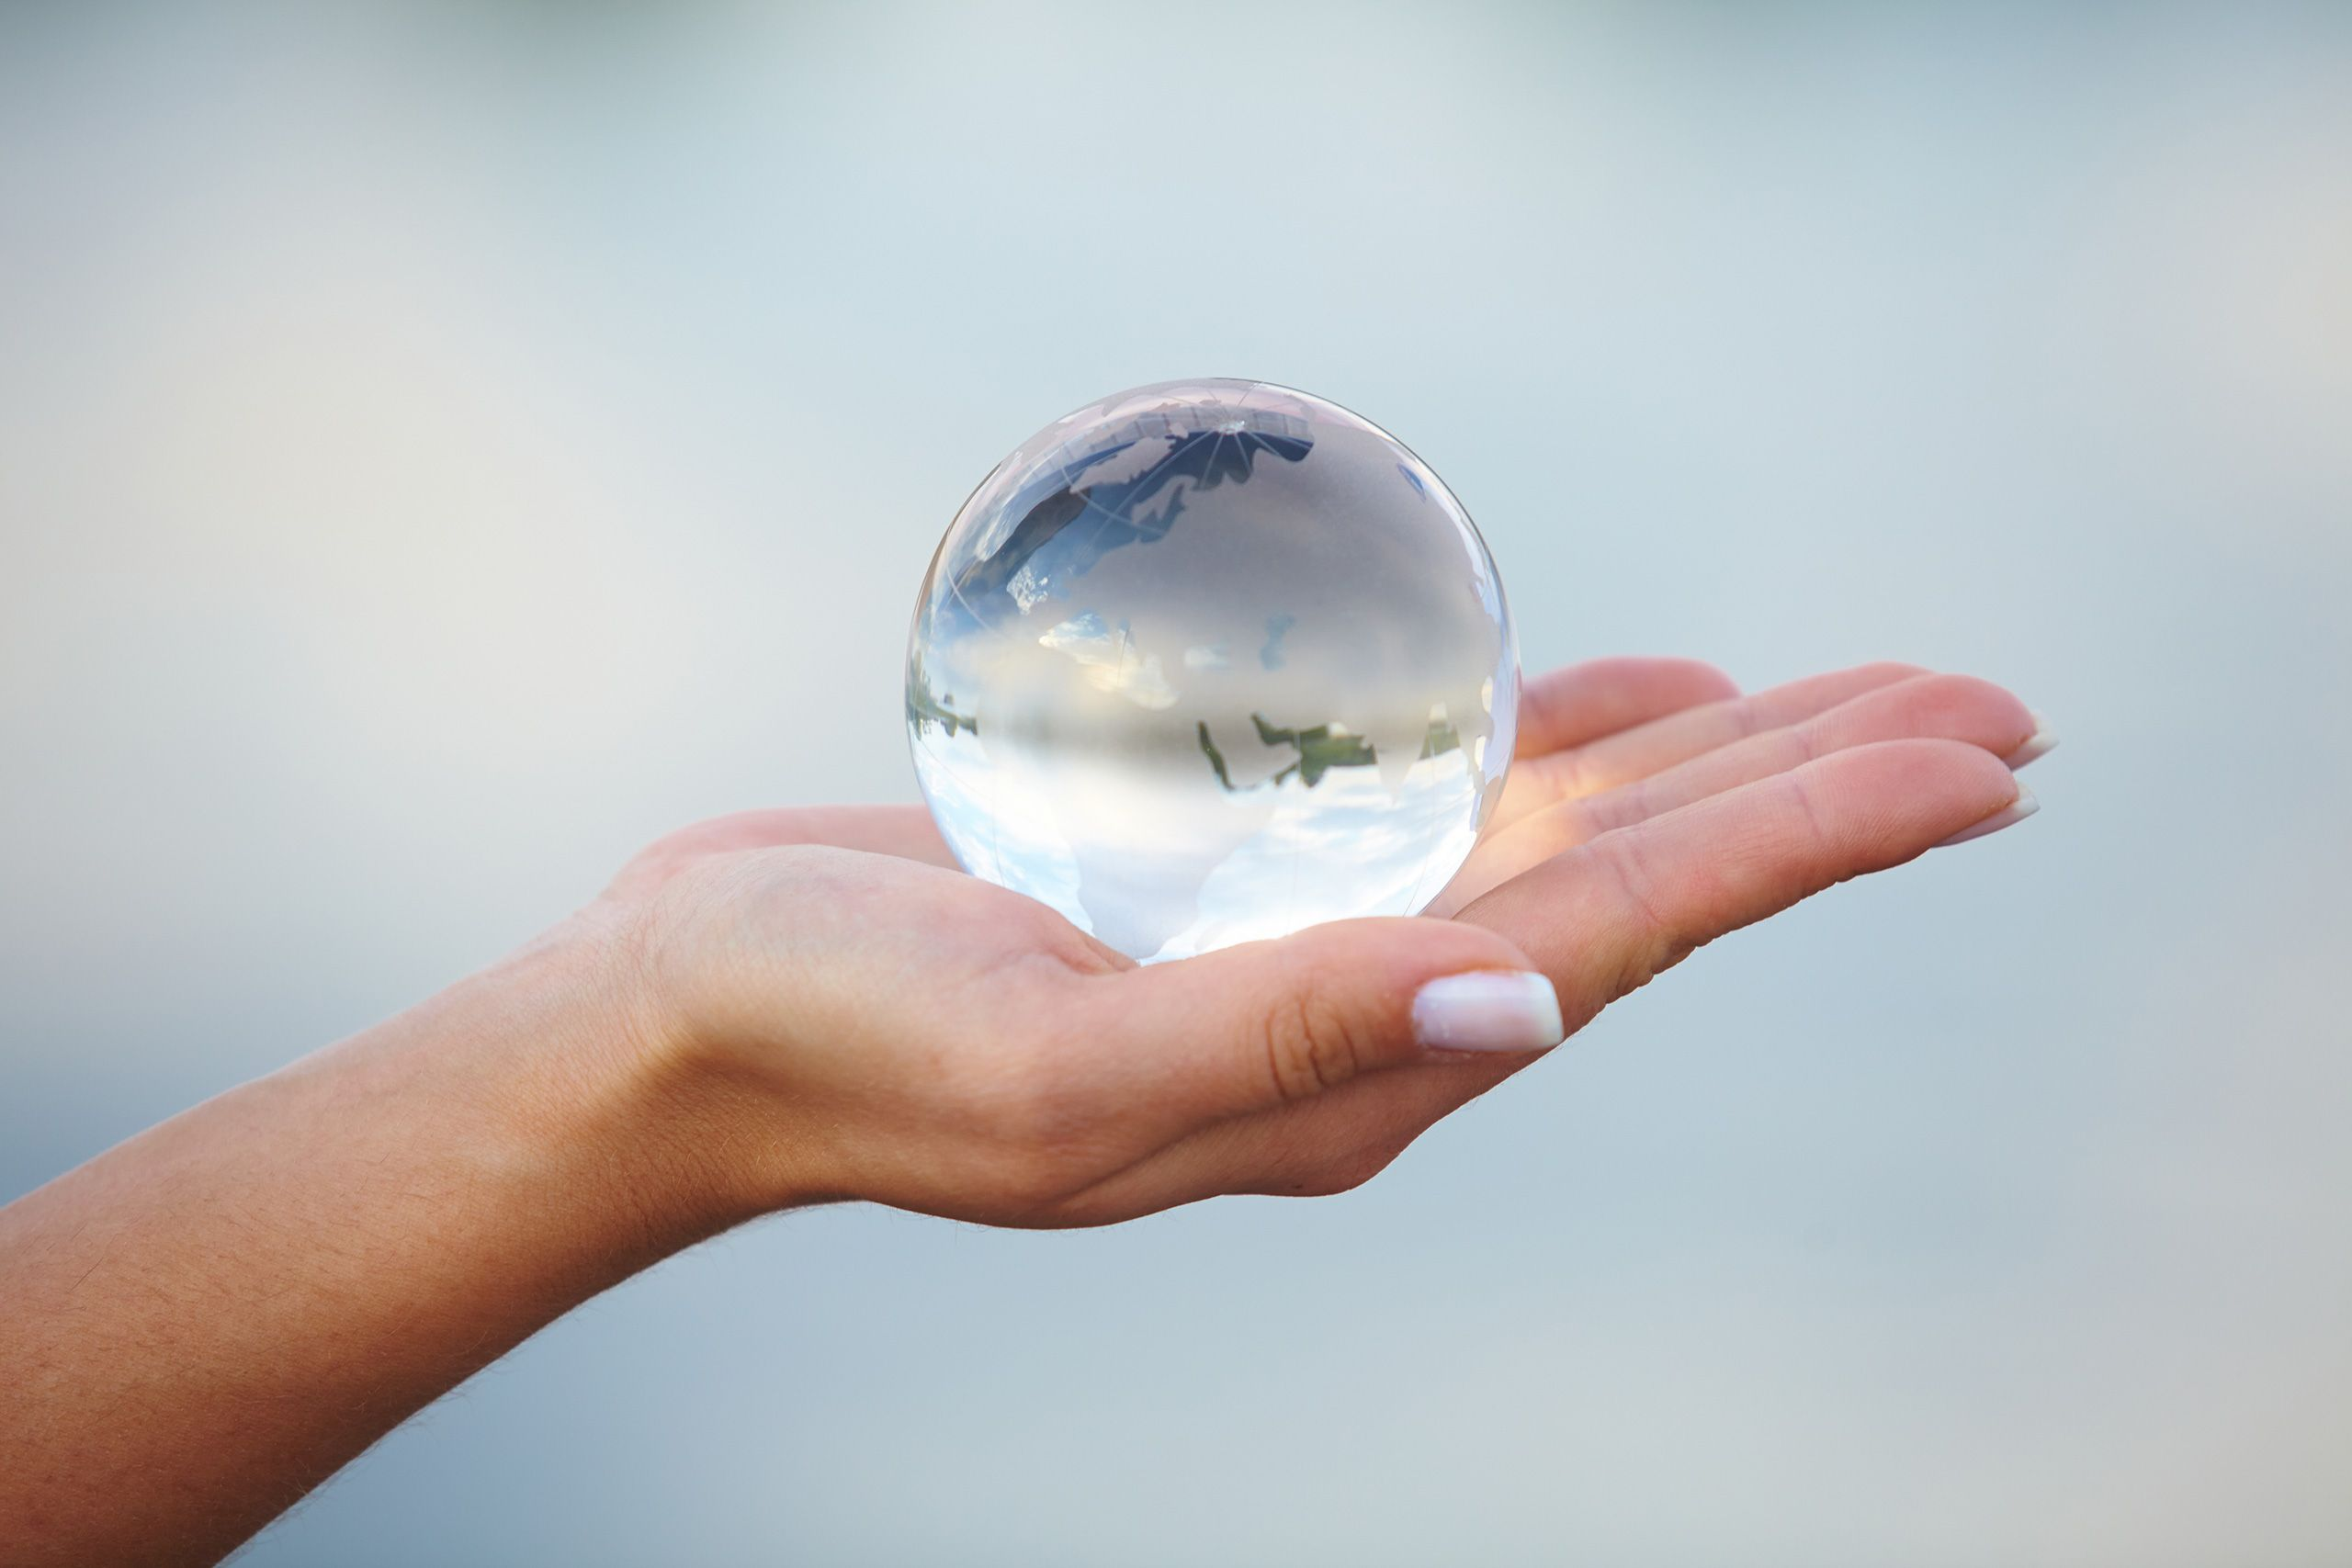 holding-globe.jpg